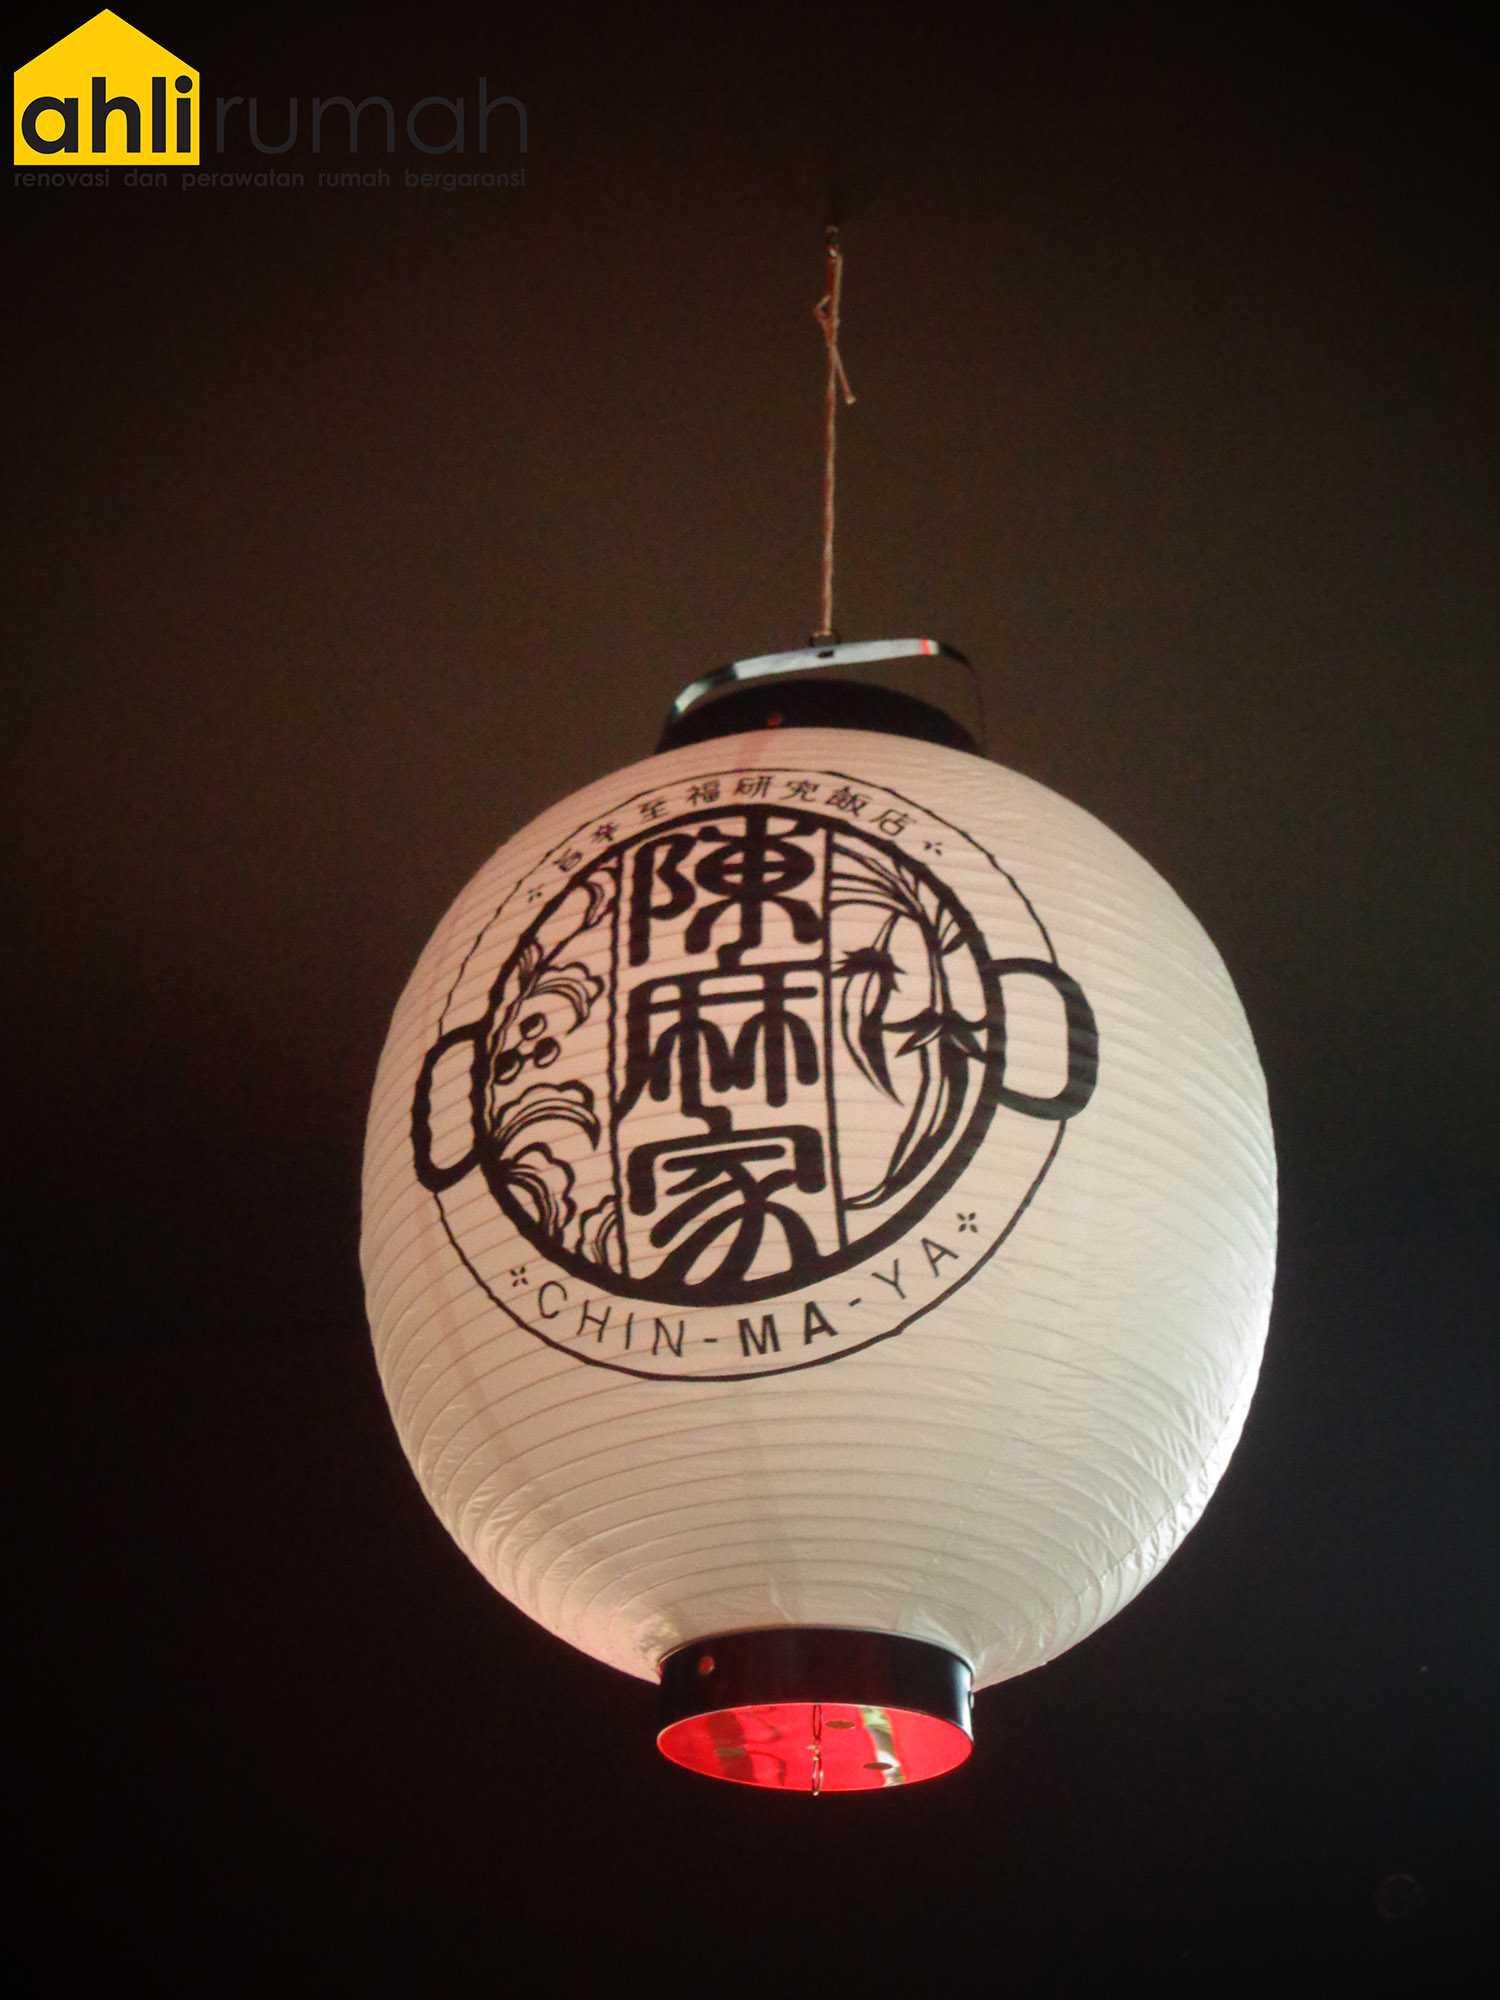 Ahlirumah.id Interior - Chin Maya Restauran Ruko Glaze 2 Blok D No. 17, Jl. Boulevard Raya Gading Serpong, Klp. Dua, Tangerang, Banten 15810, Indonesia  Interior Deocration   49233